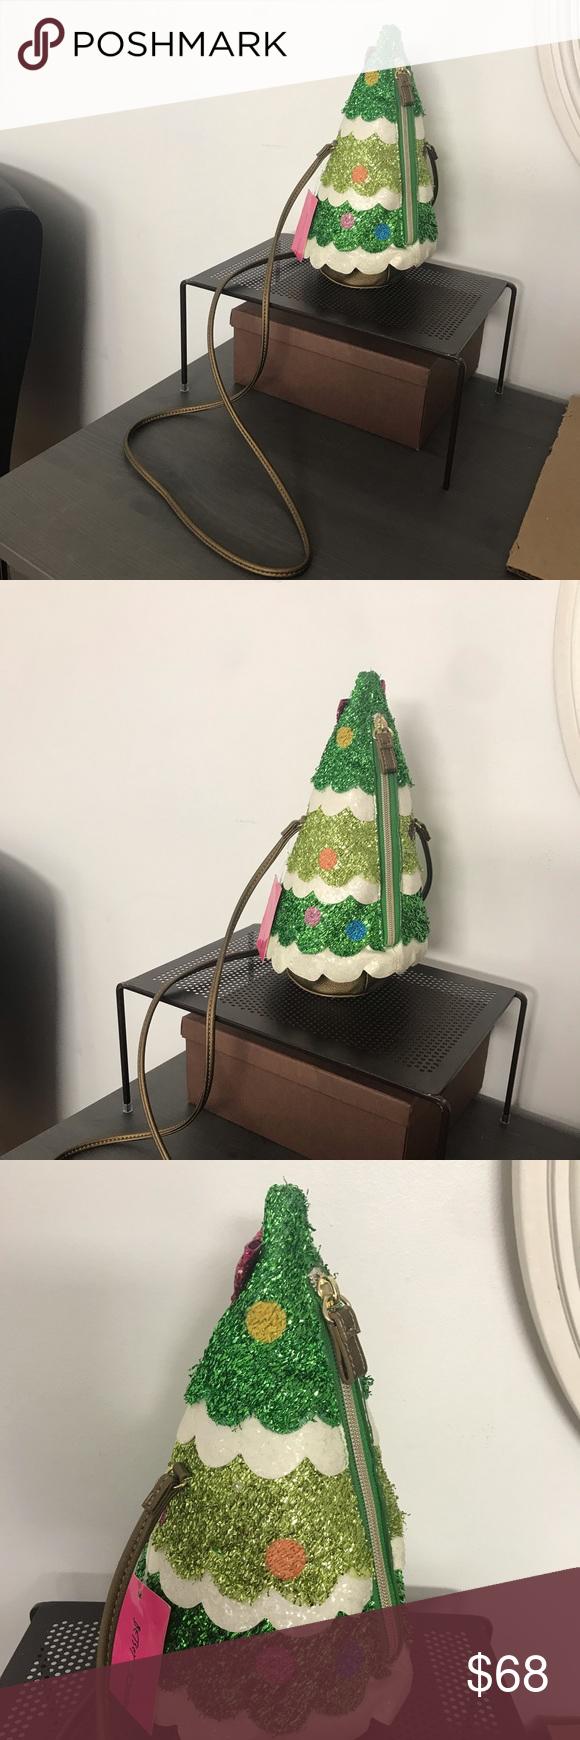 Betsey Johnson Lightup Christmas Tree NWT Betsey johnson